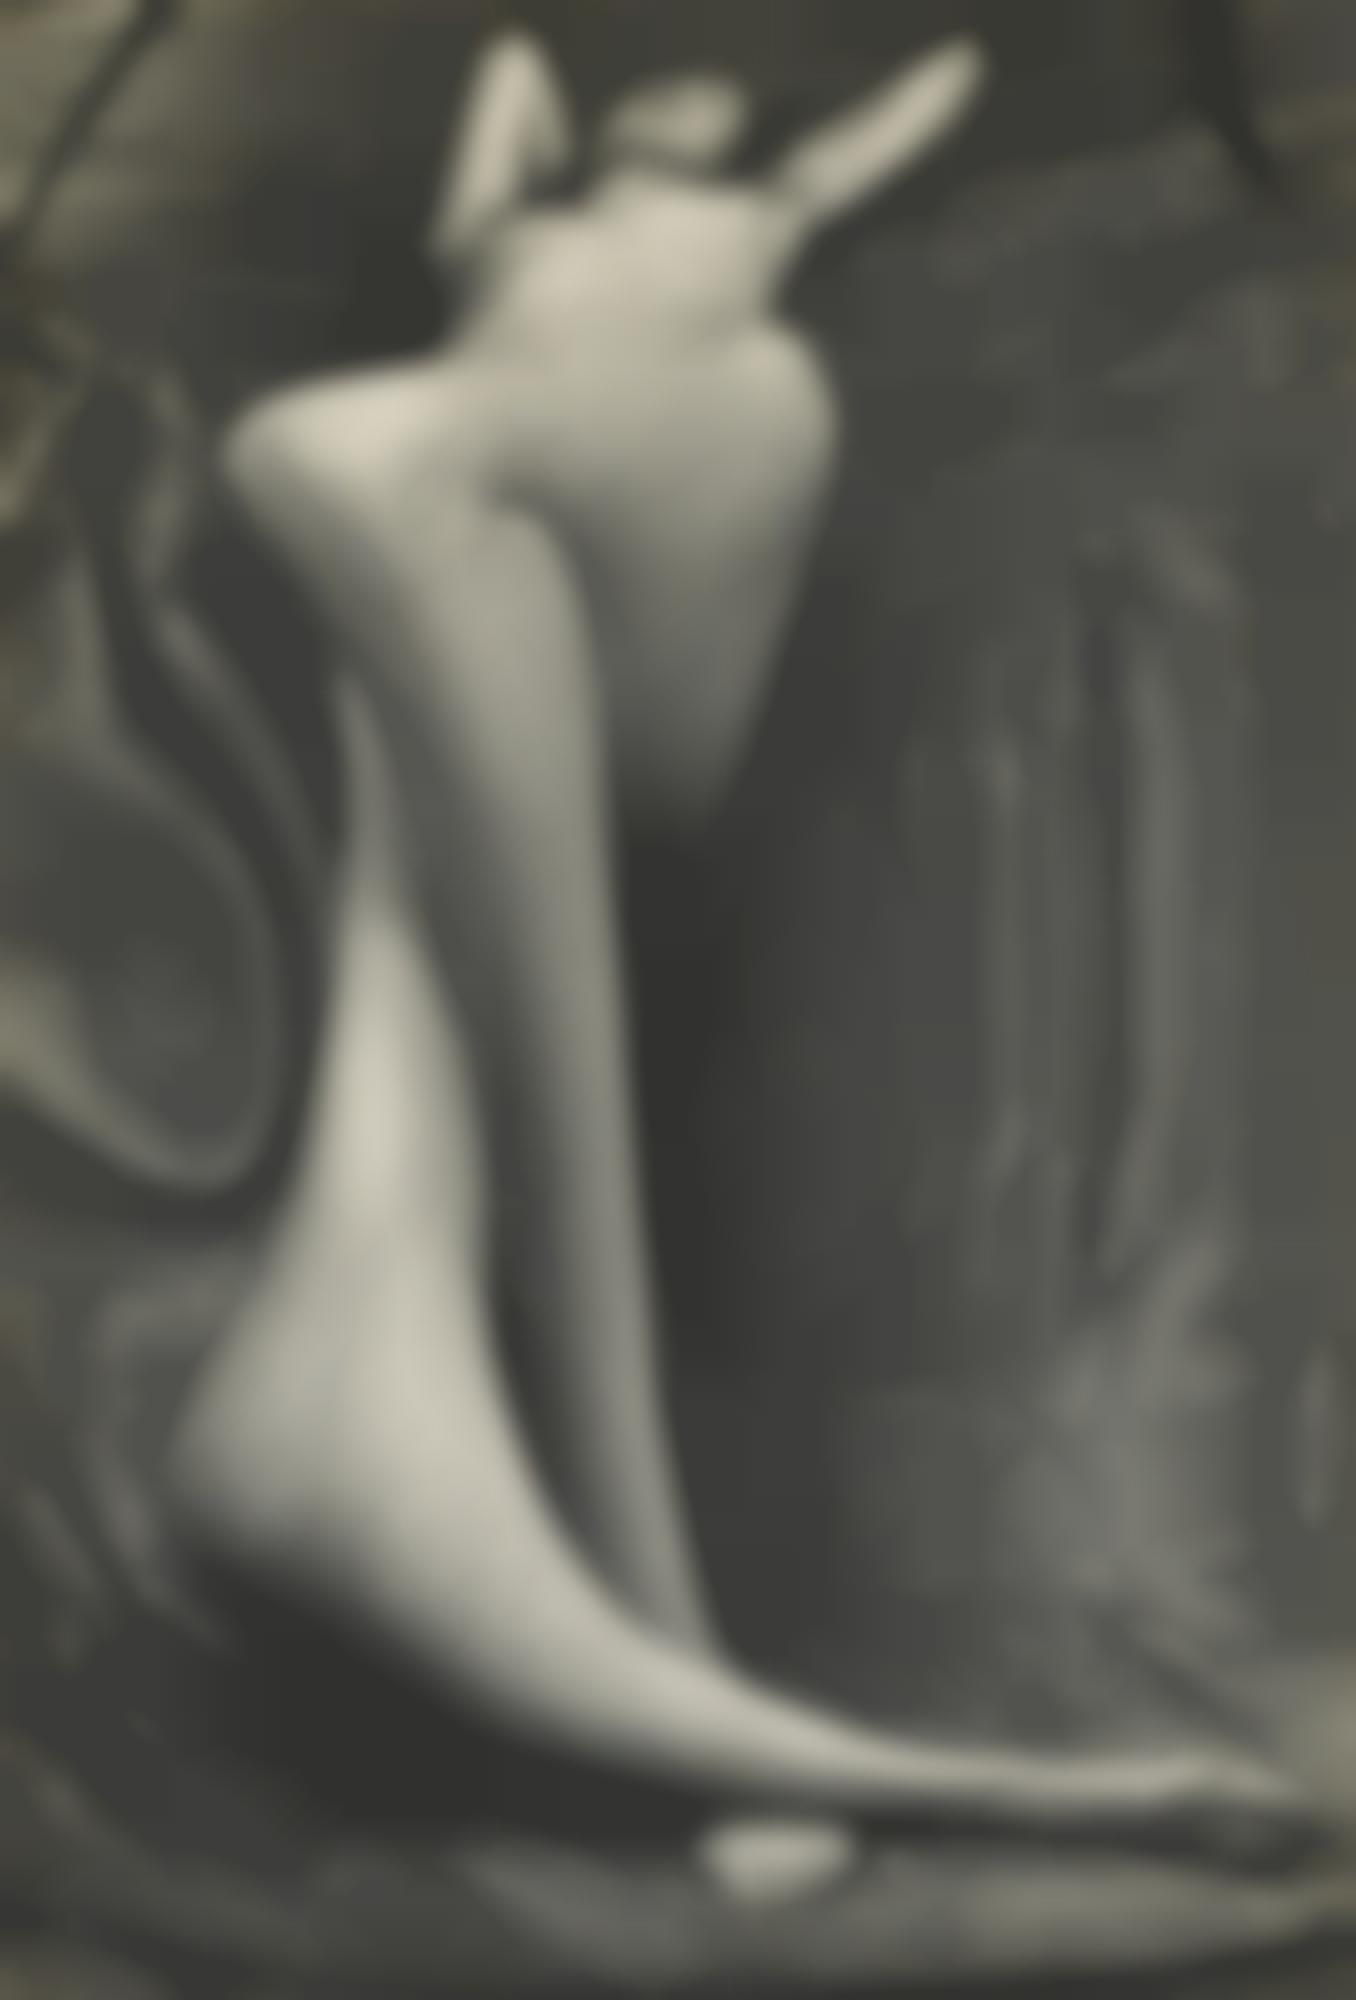 Andre Kertesz-Distortion #137-1933